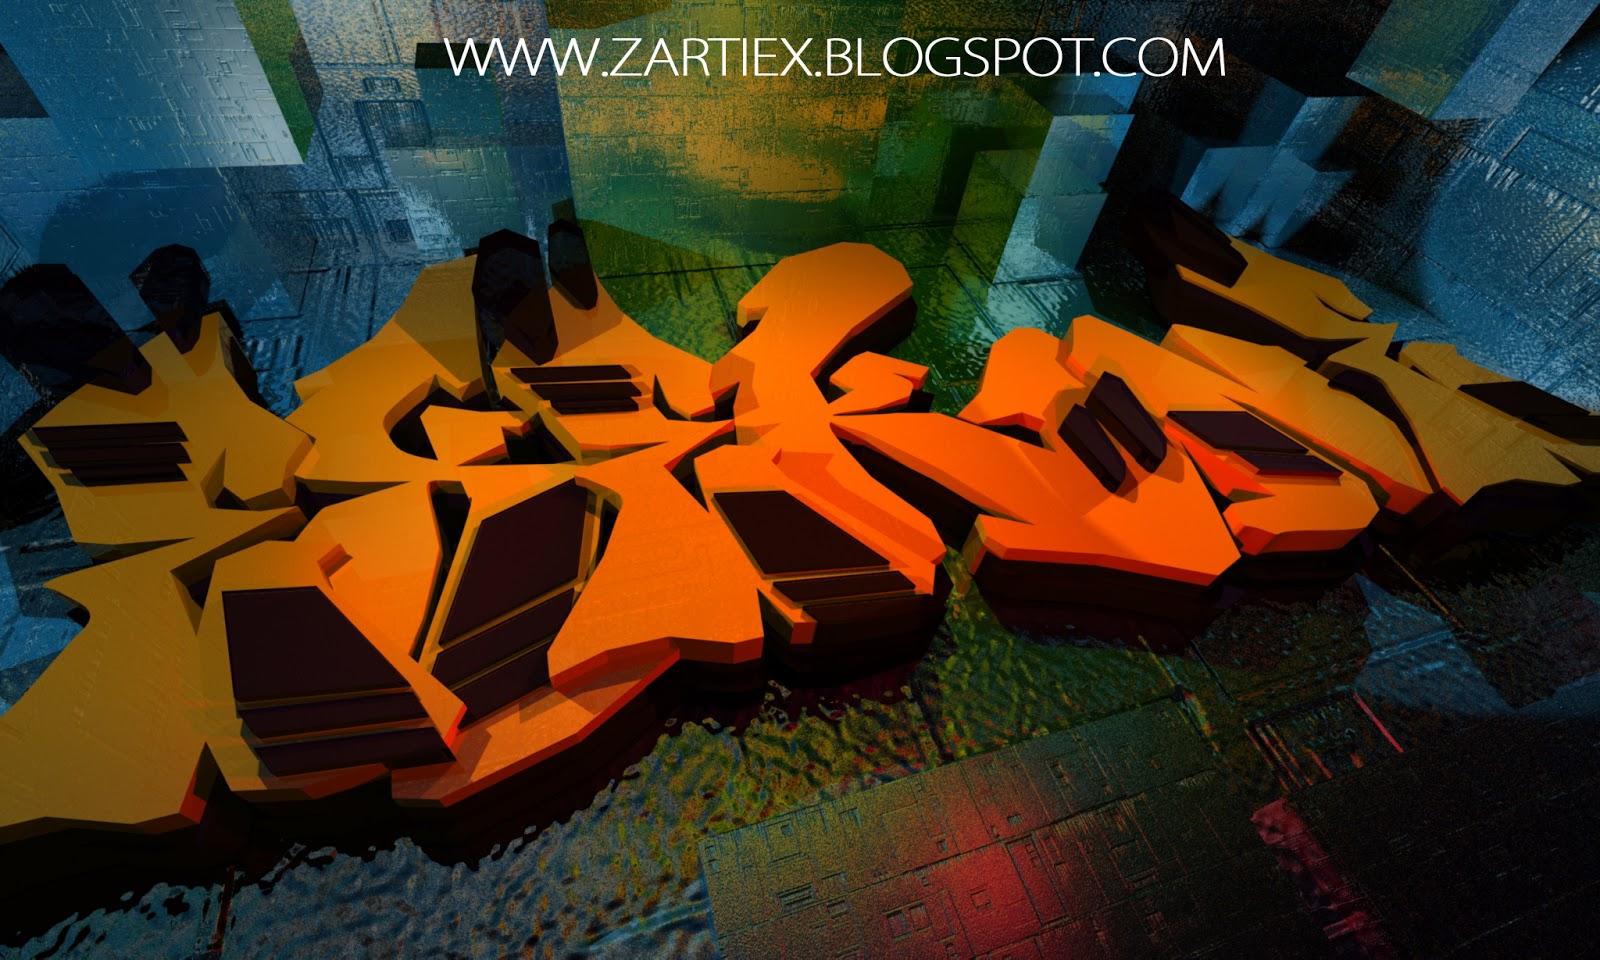 Alphabet U Wallpapers 3d Graffitis De Madrid Nuevas Letras De Graffiti En 3d